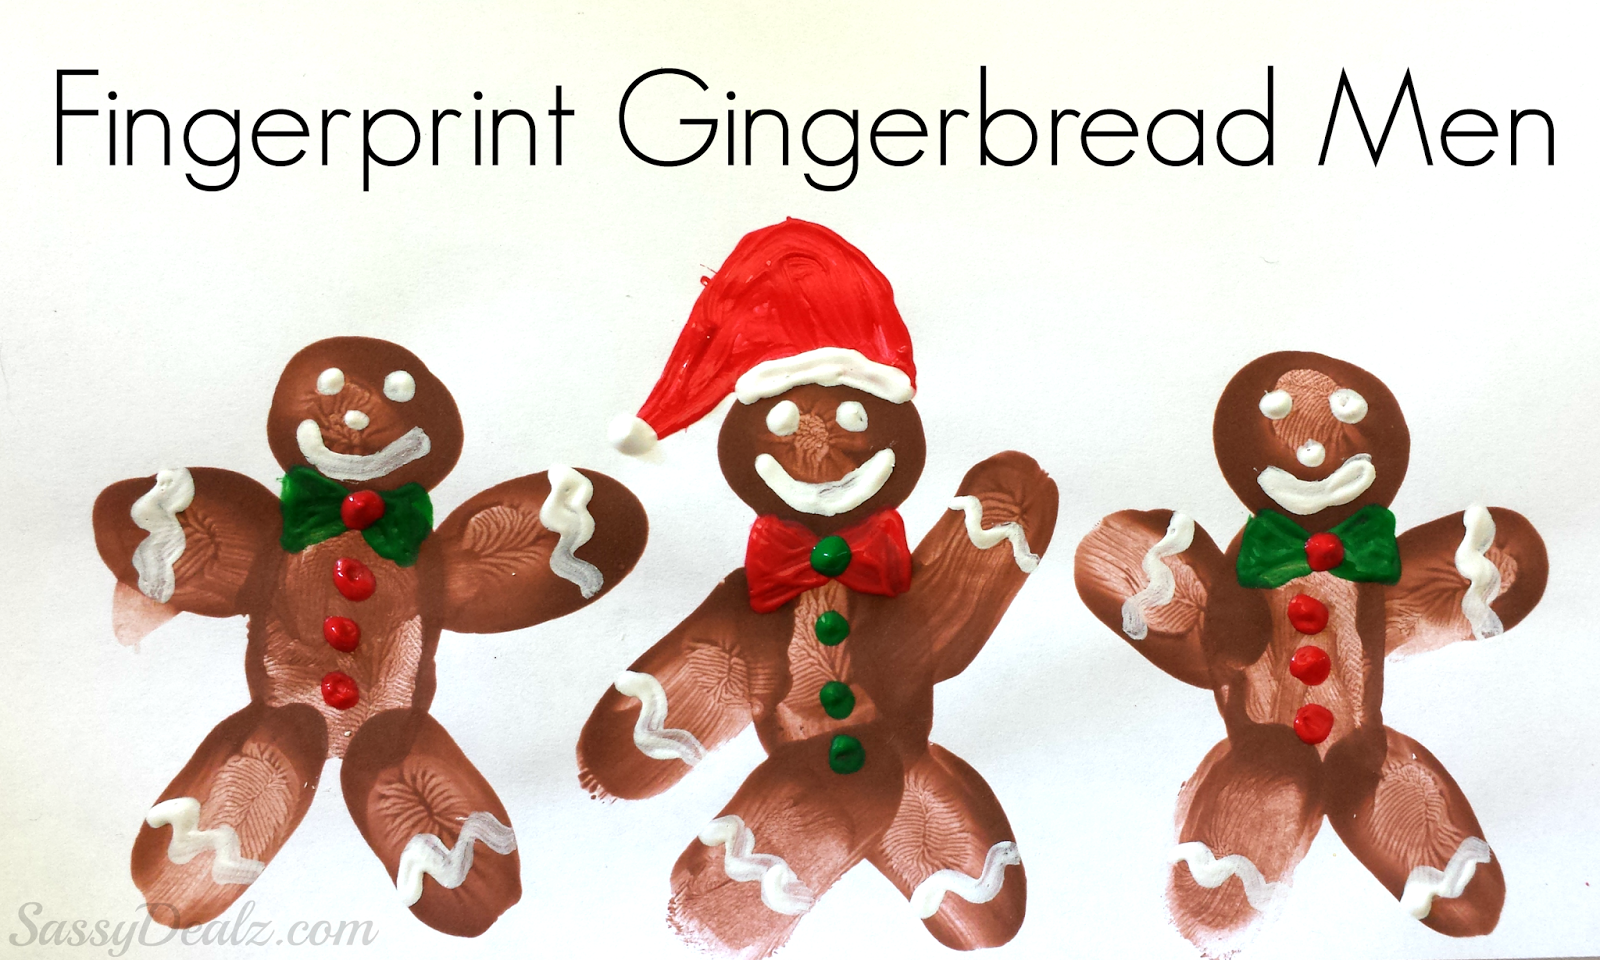 DIY Fingerprint Gingerbread Man Craft For Kids - Crafty Morning